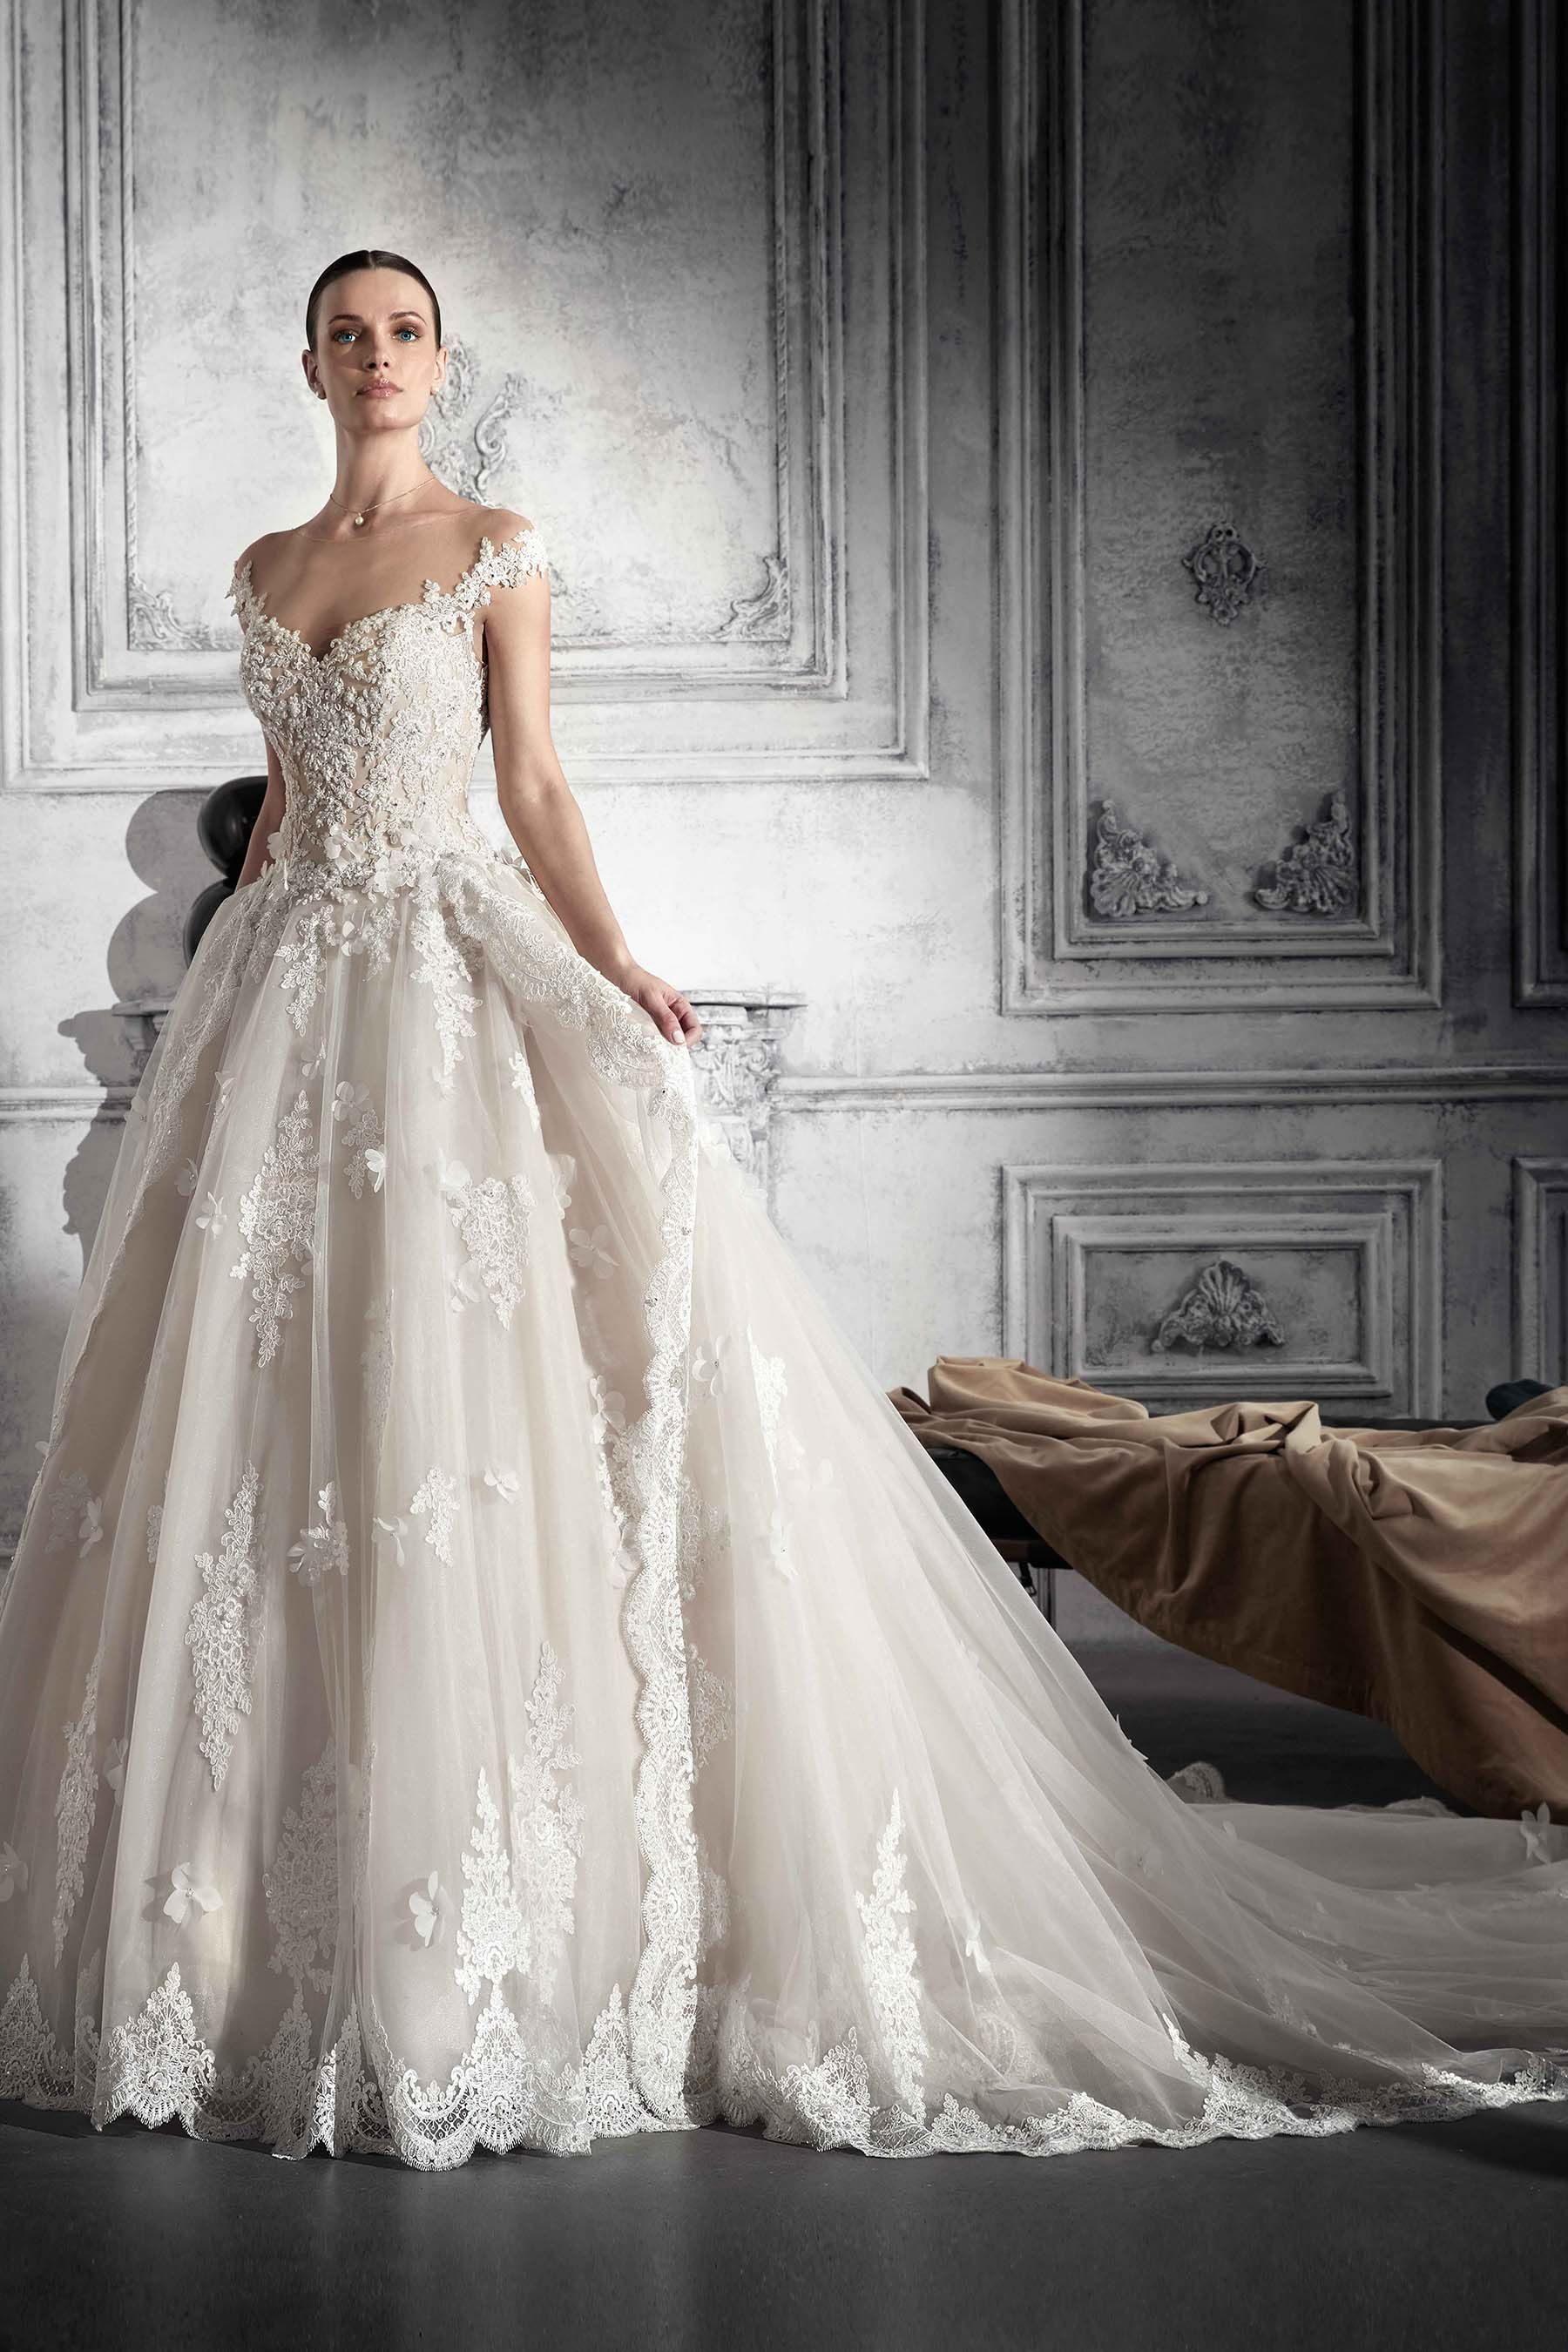 Demetrios Bride Wedding Dresses Bridal Evening Dresses Demetrios Bridal Gowns Demetrios C Ball Gowns Wedding Demetrios Wedding Dress Wedding Dresses